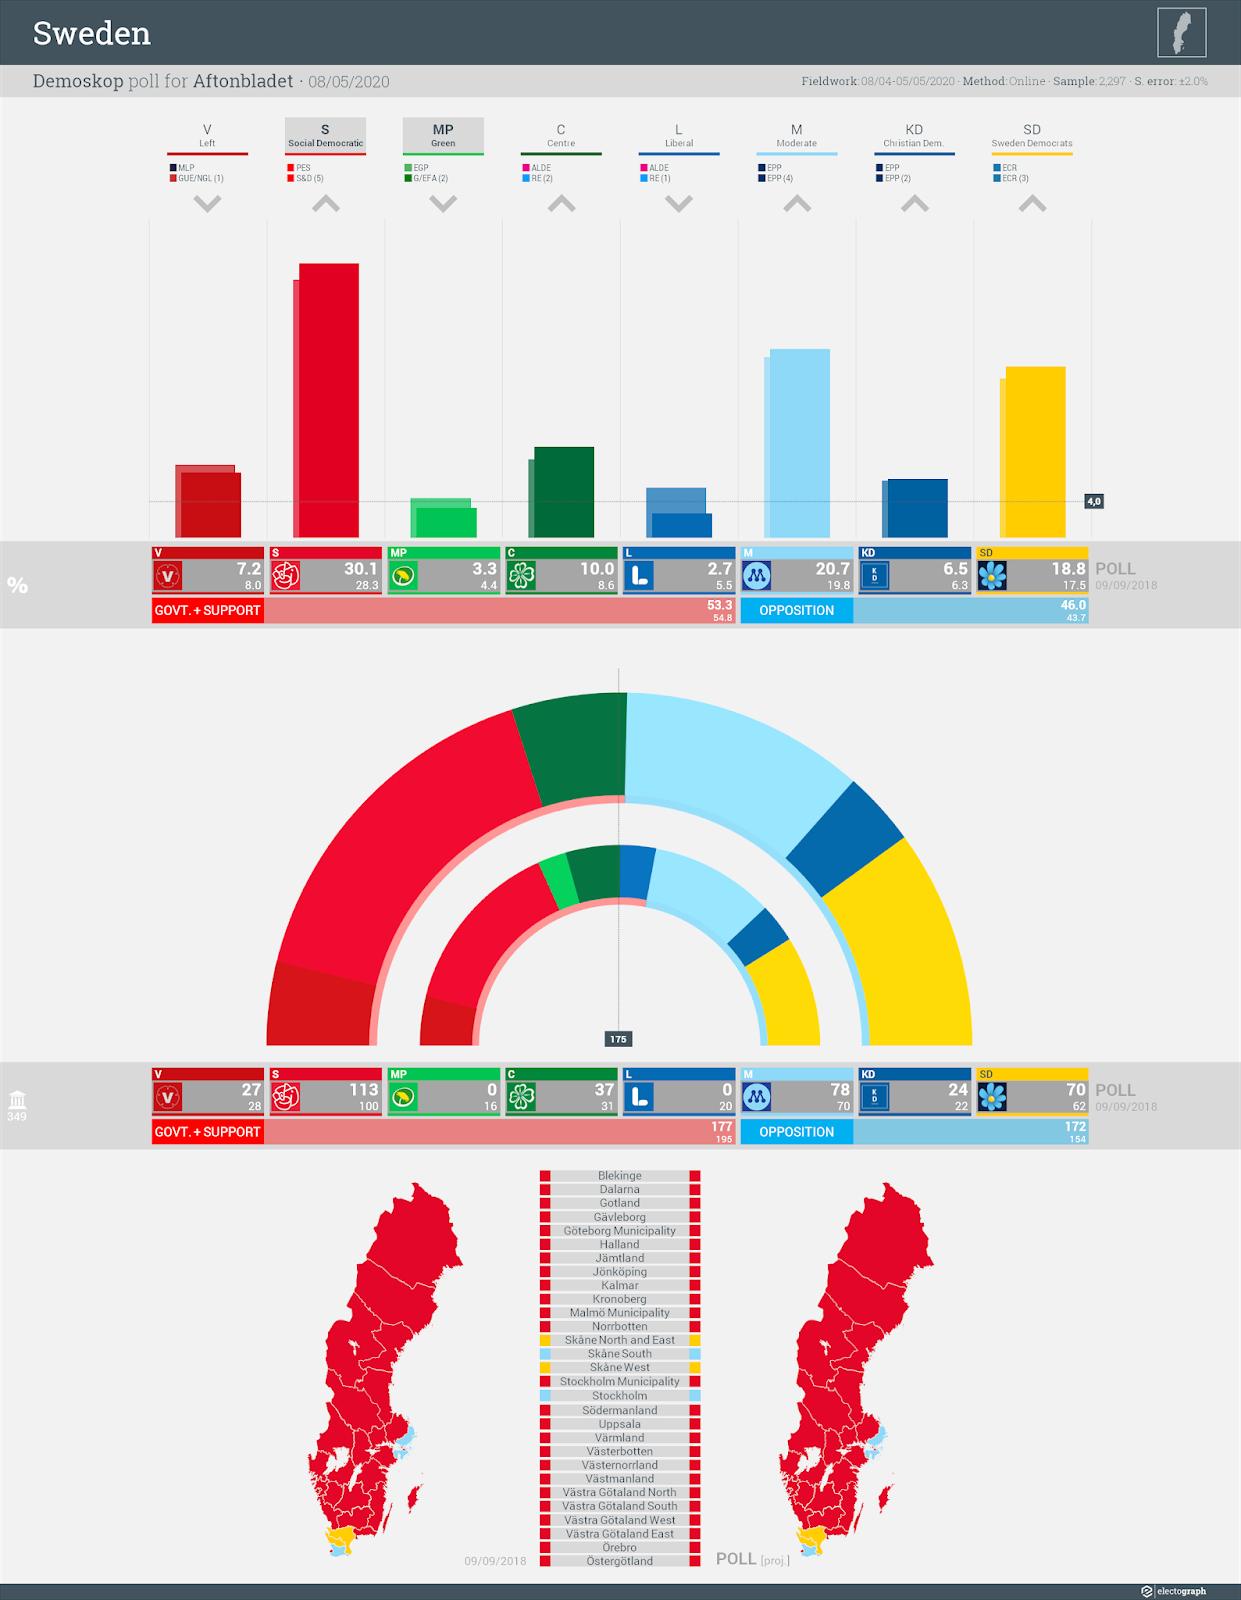 SWEDEN: Demoskop poll chart for Aftonbladet, 8 May 2020